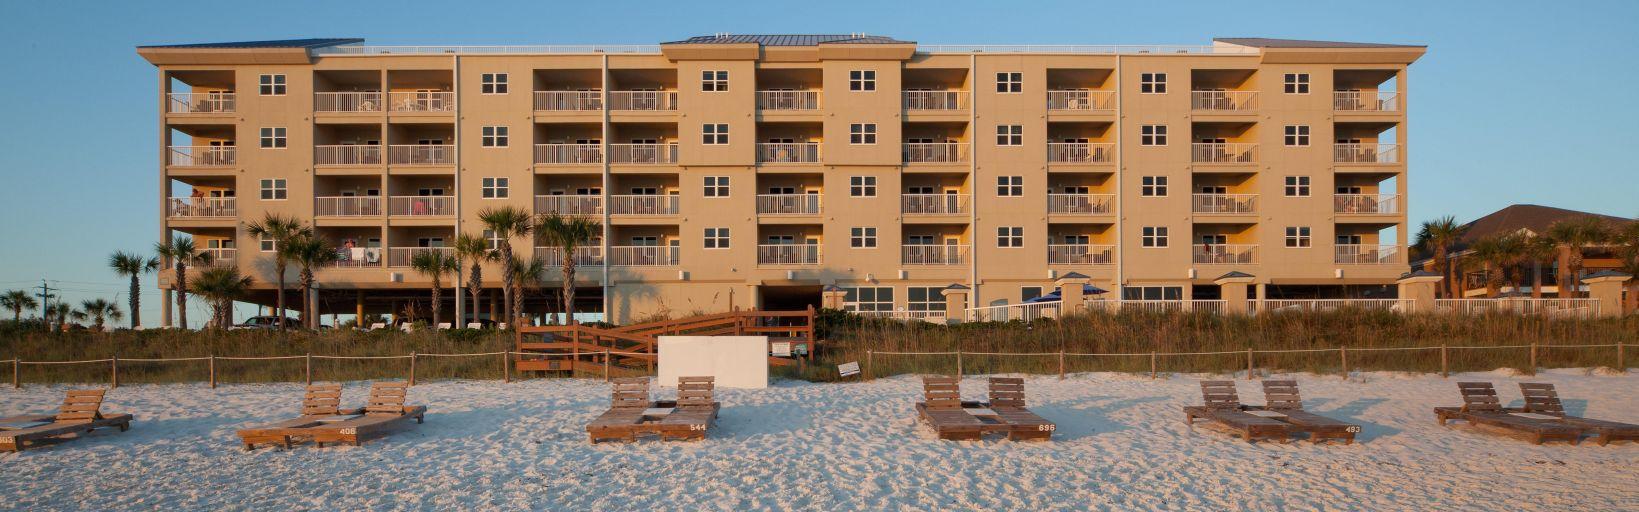 Villa Cau Panama City Beach The Best Beaches In World